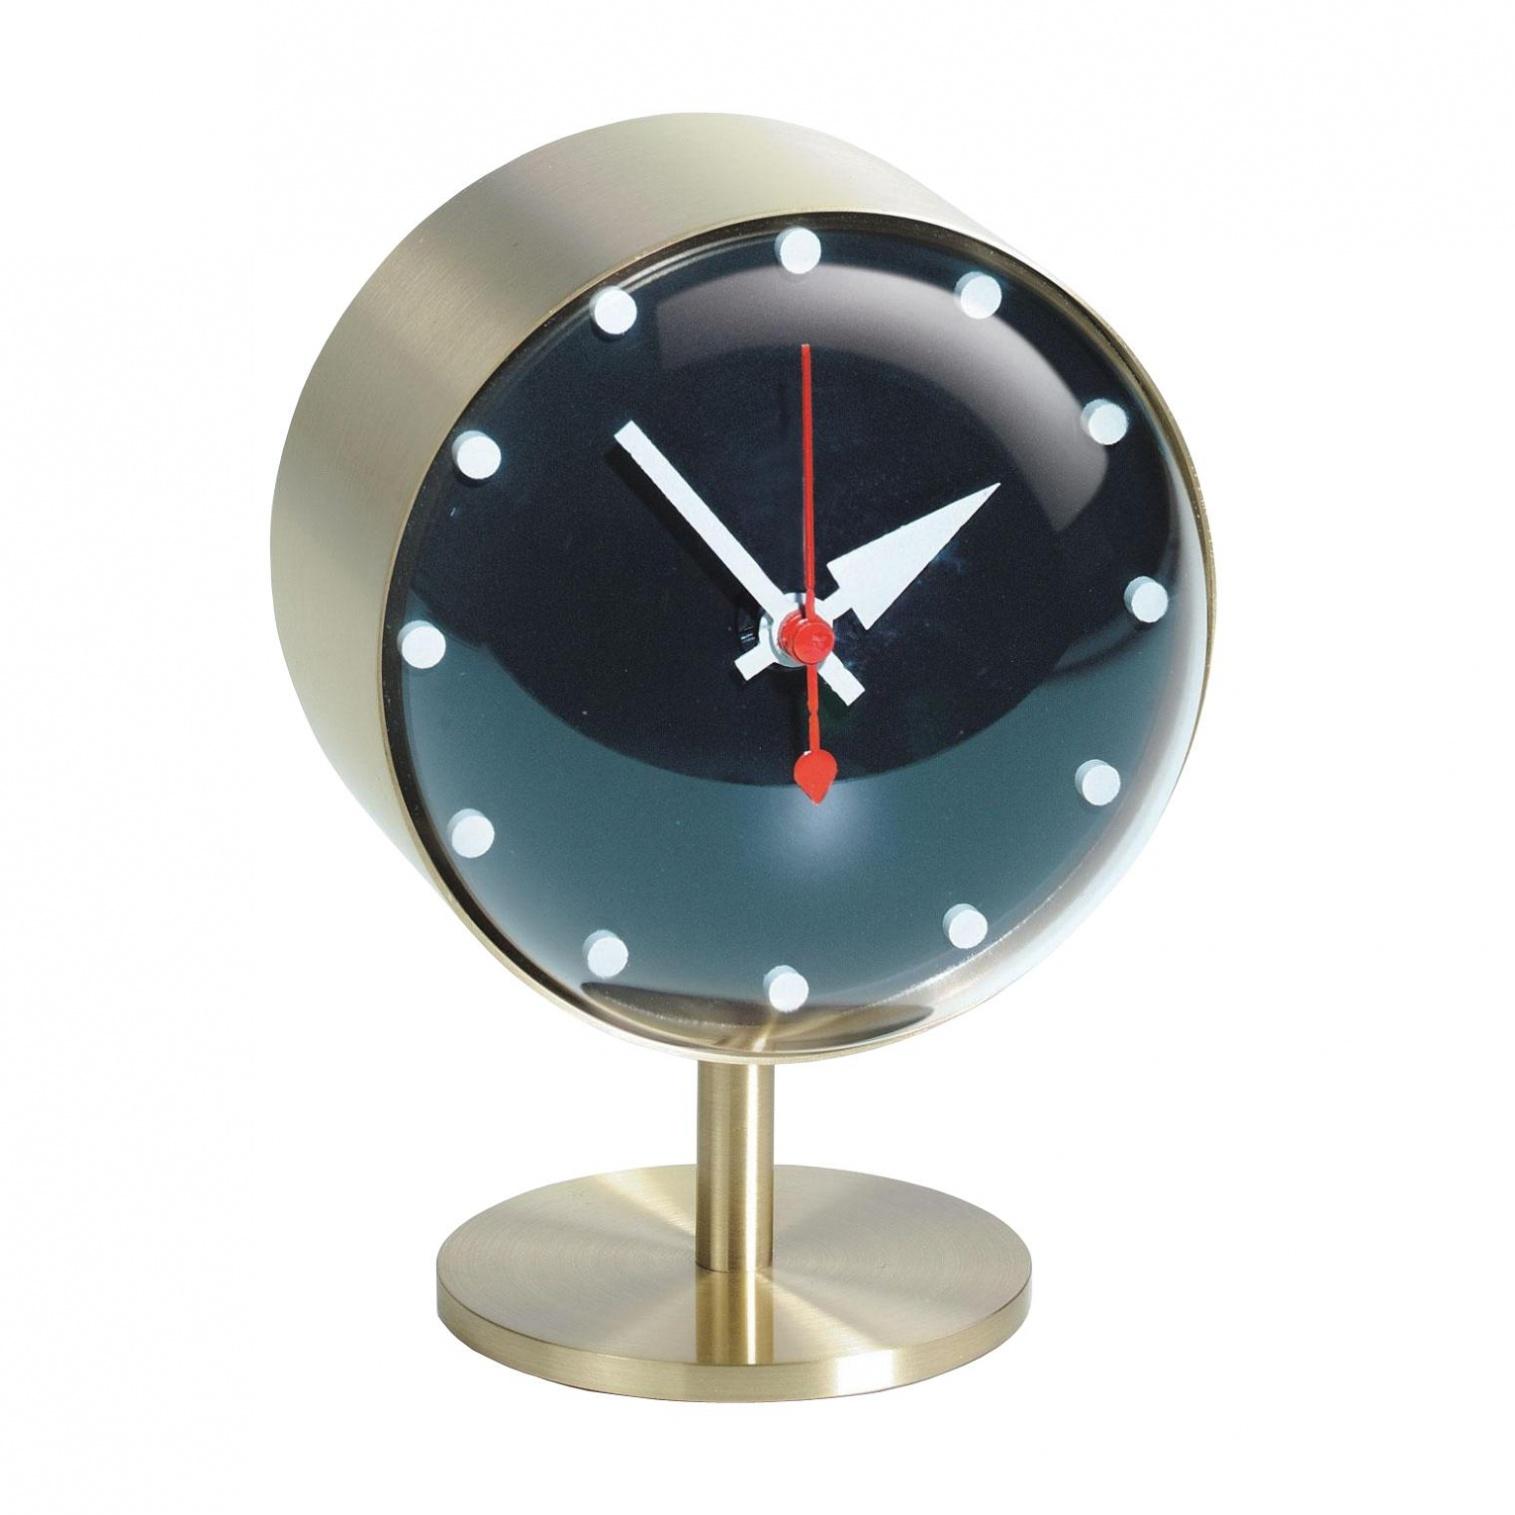 5cm Clock Vitra Nelson Night Messingacrylglasø10 Tischuhr qSzUpMV